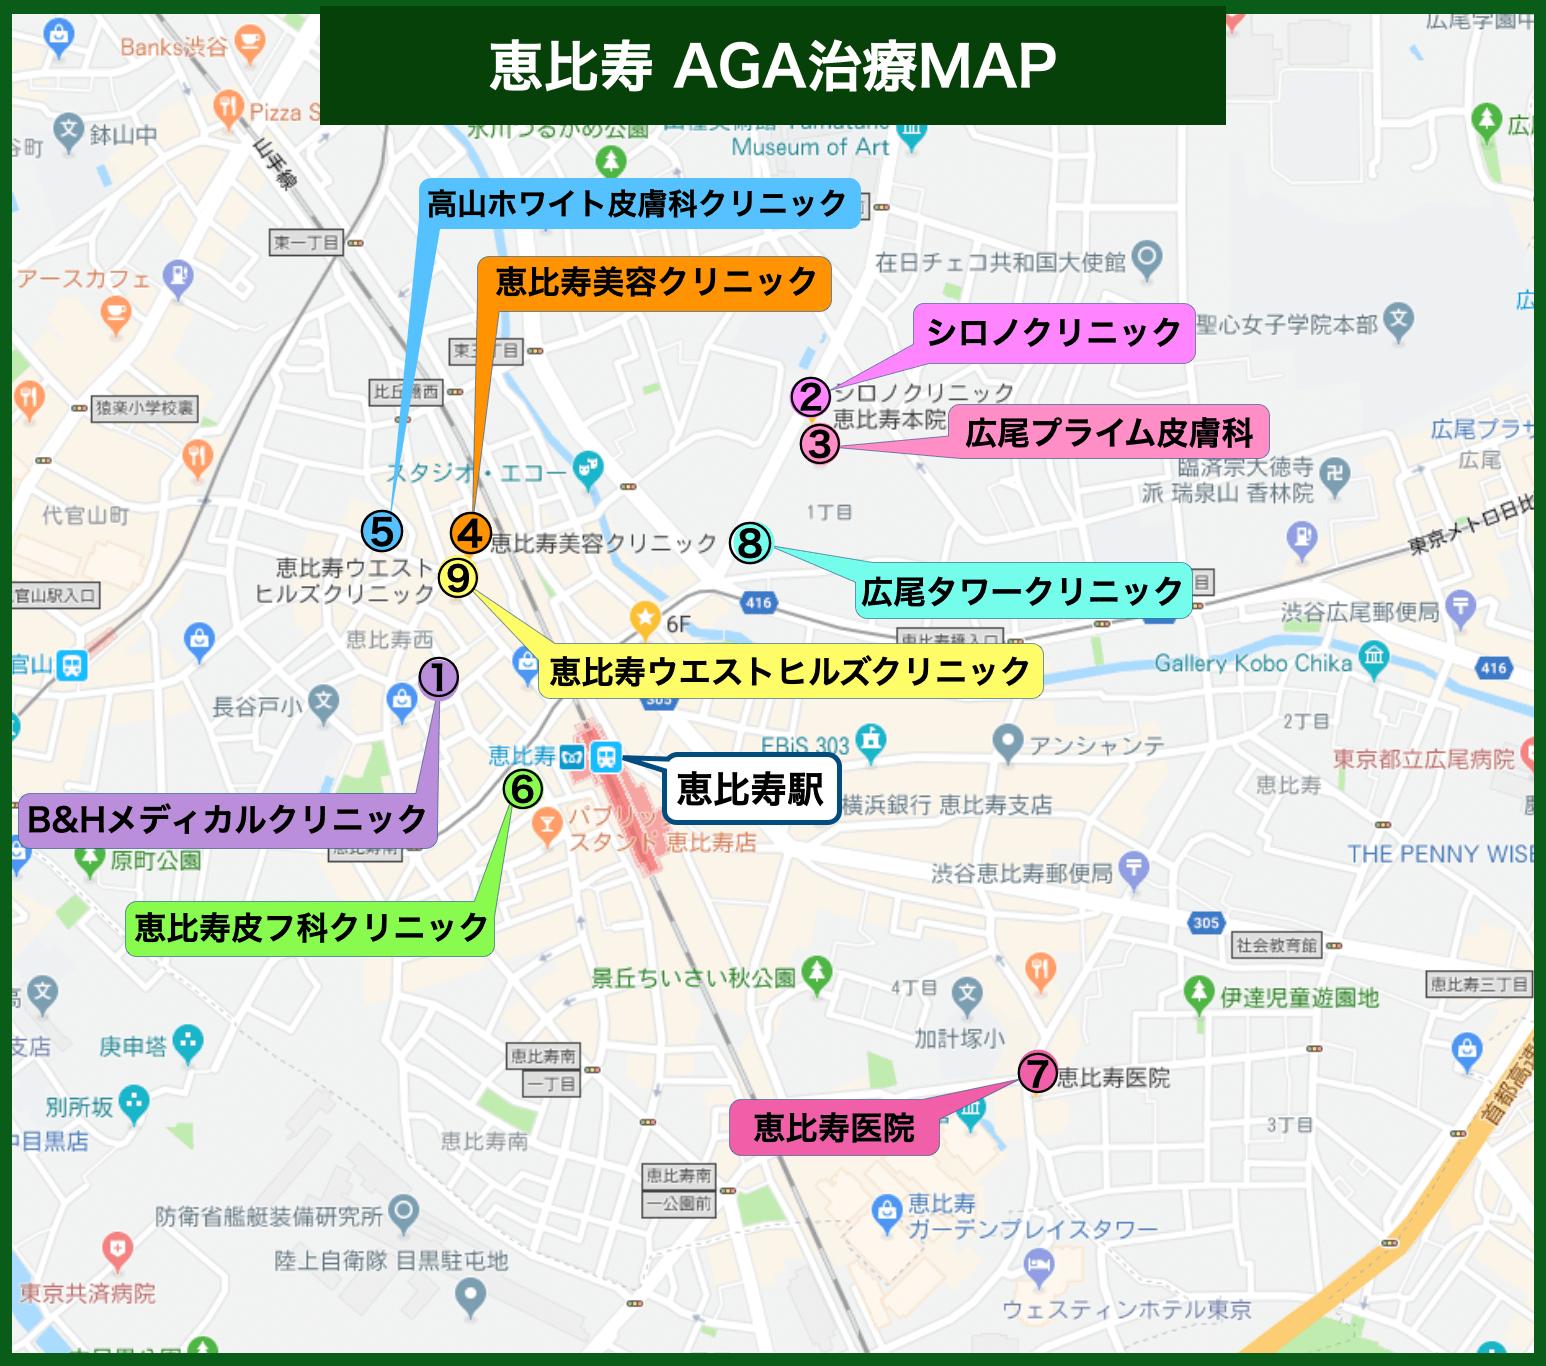 恵比寿AGA治療MAP